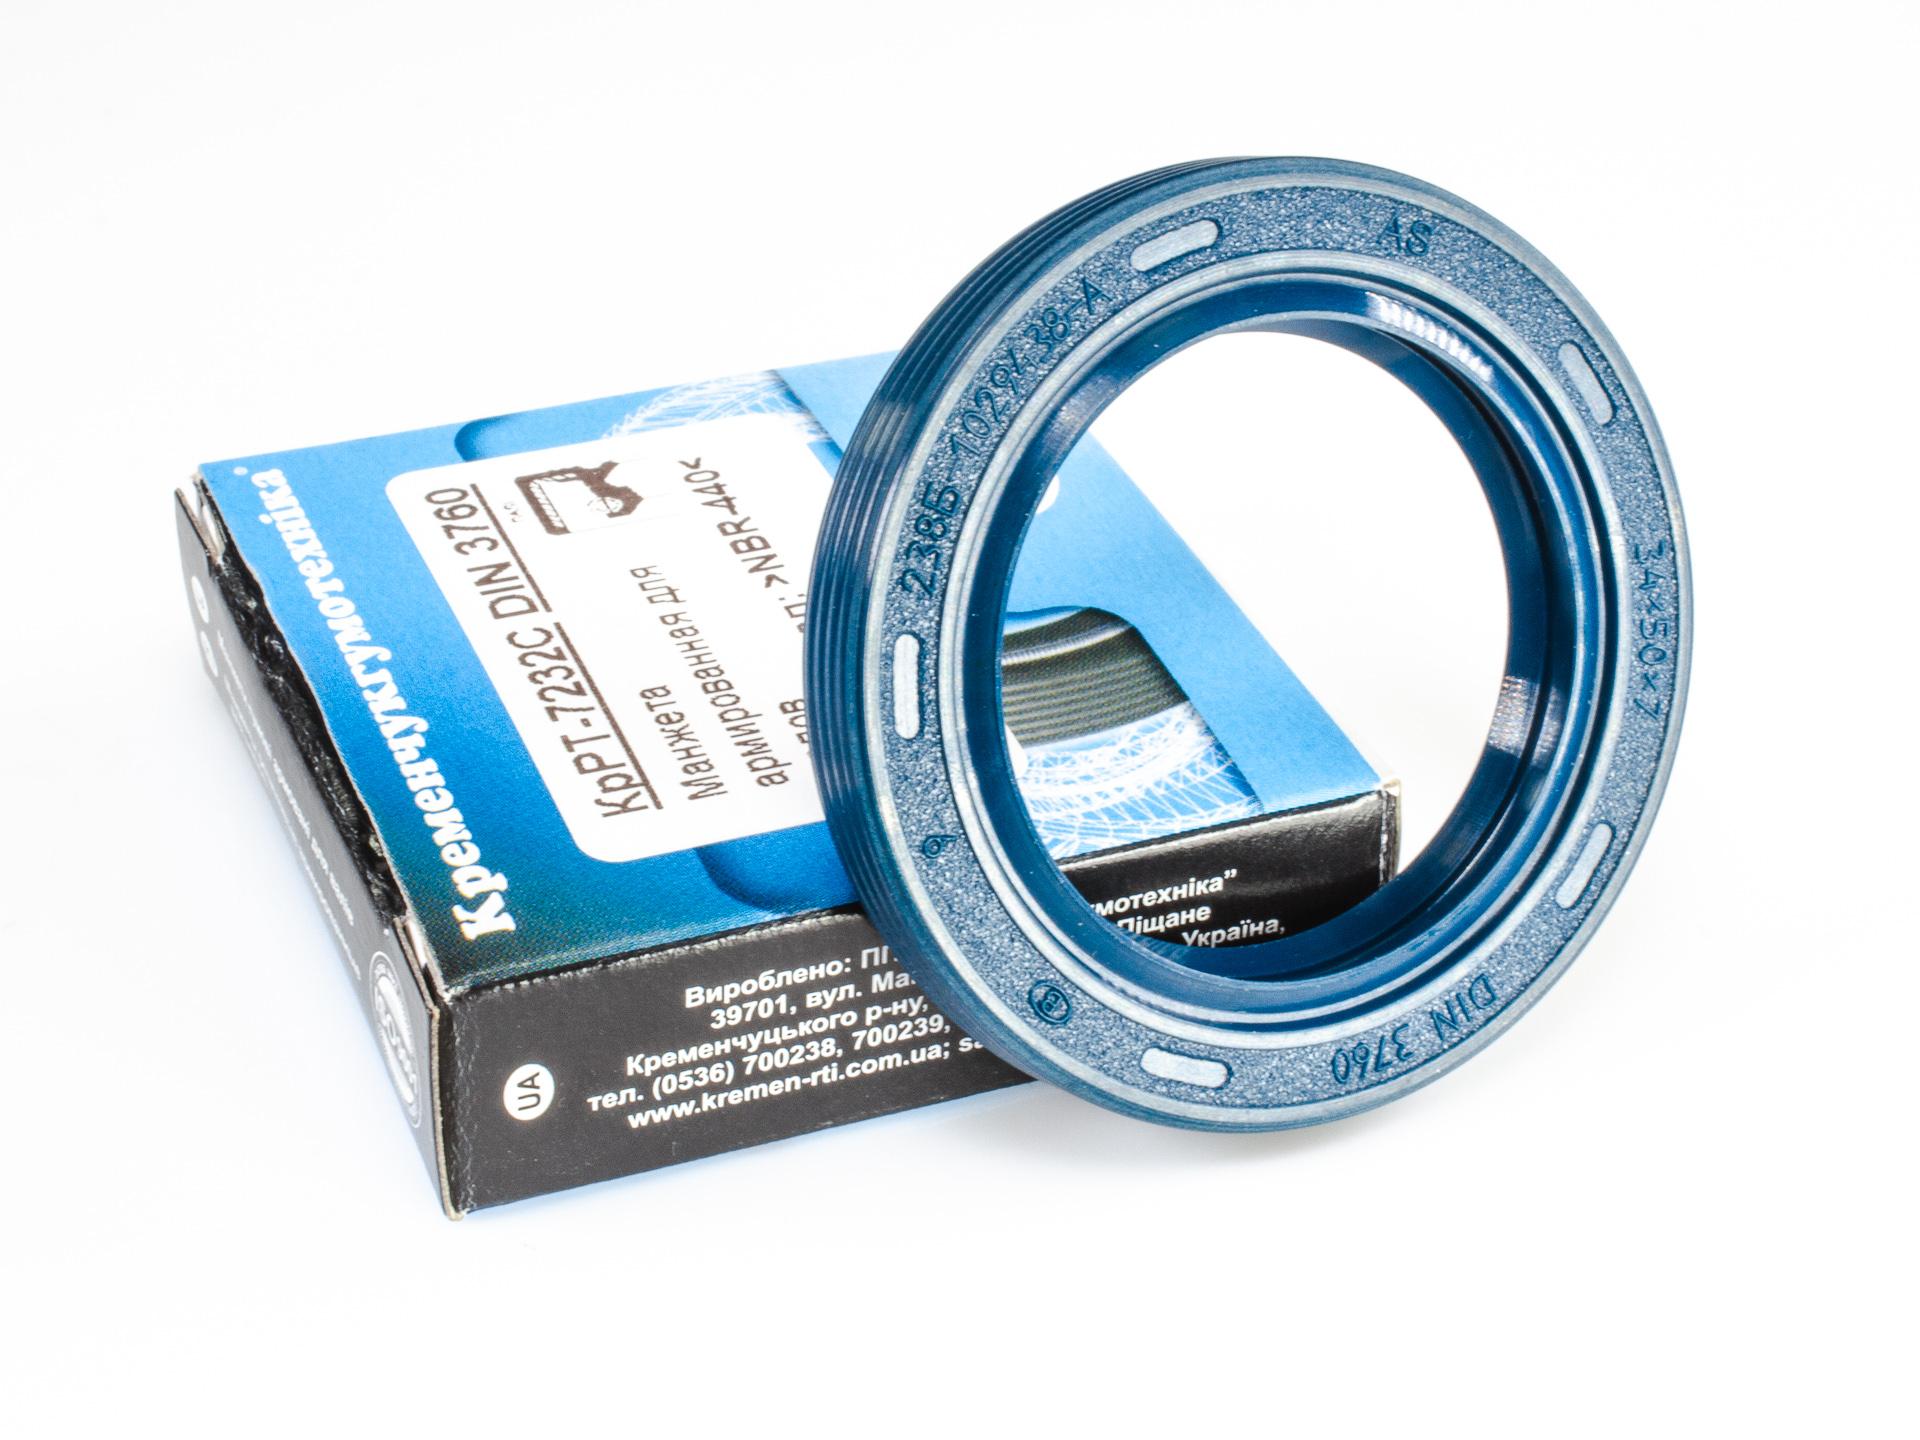 Radial-Wellendichtring DIN 3760 AS 20,0 x 47,0 x 10,0 mm NBR 1 St.